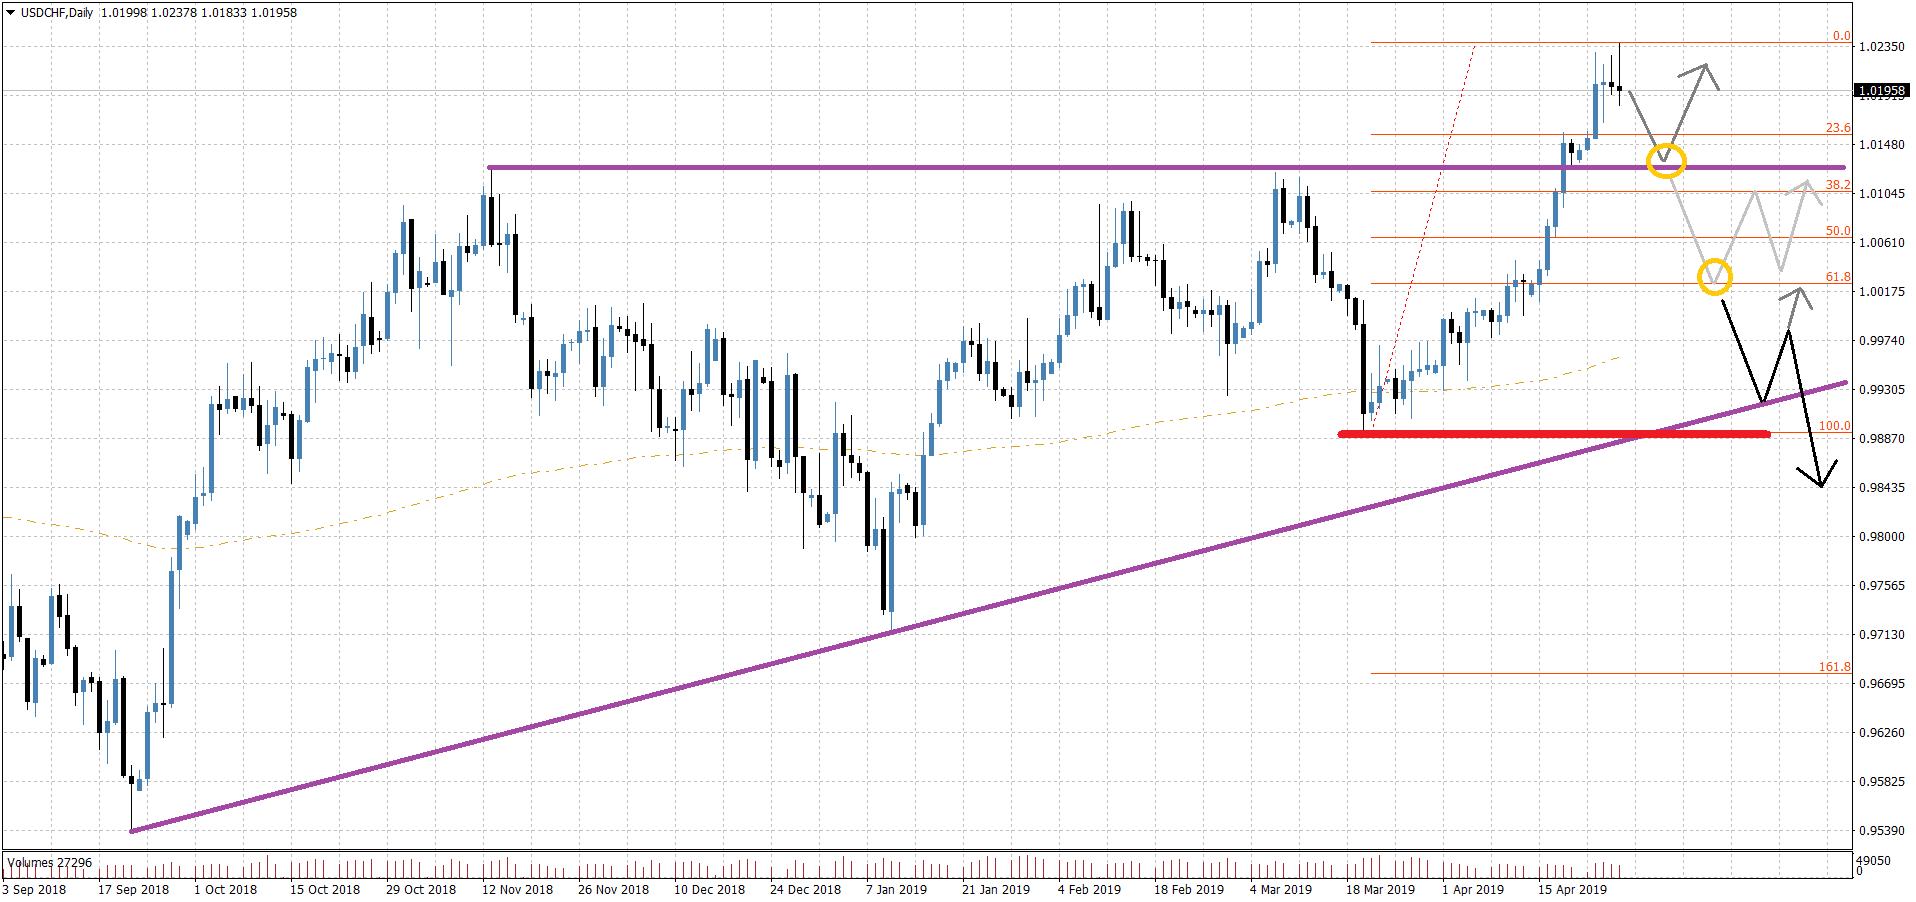 Kurzfristiges Trading-Setup im USD/CHF